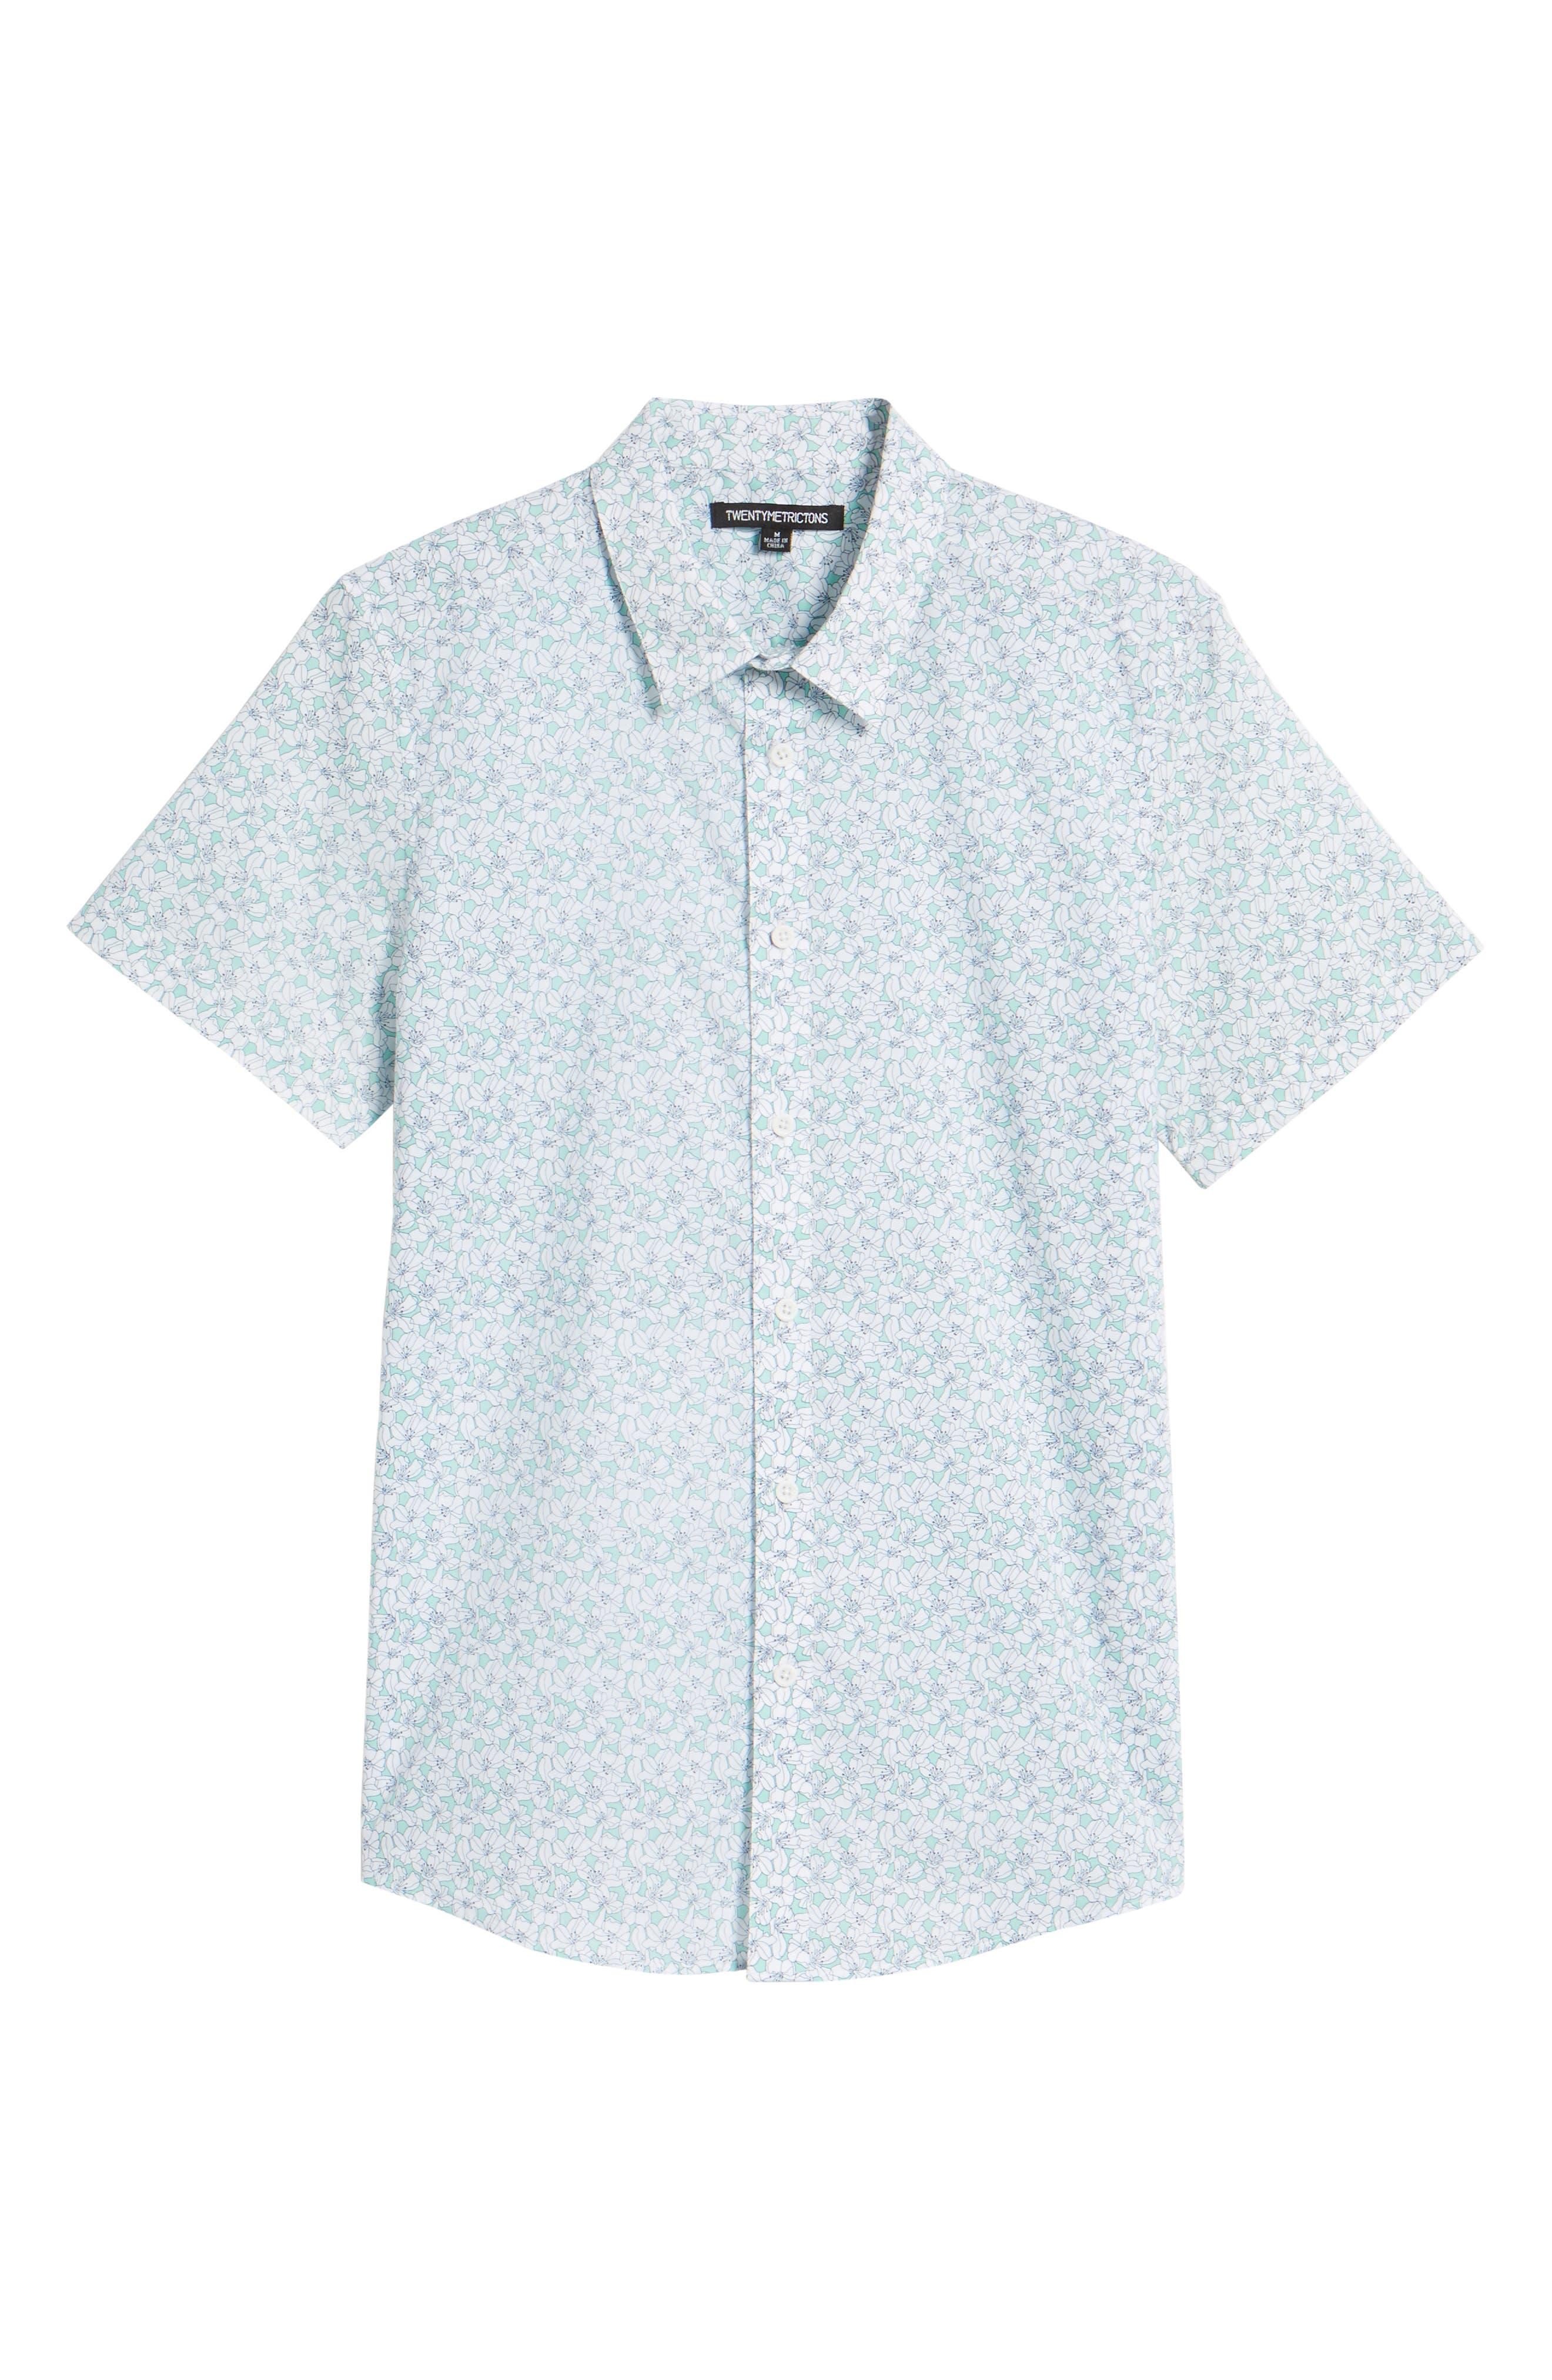 Slim Flit Floral Woven Shirt,                             Alternate thumbnail 6, color,                             332